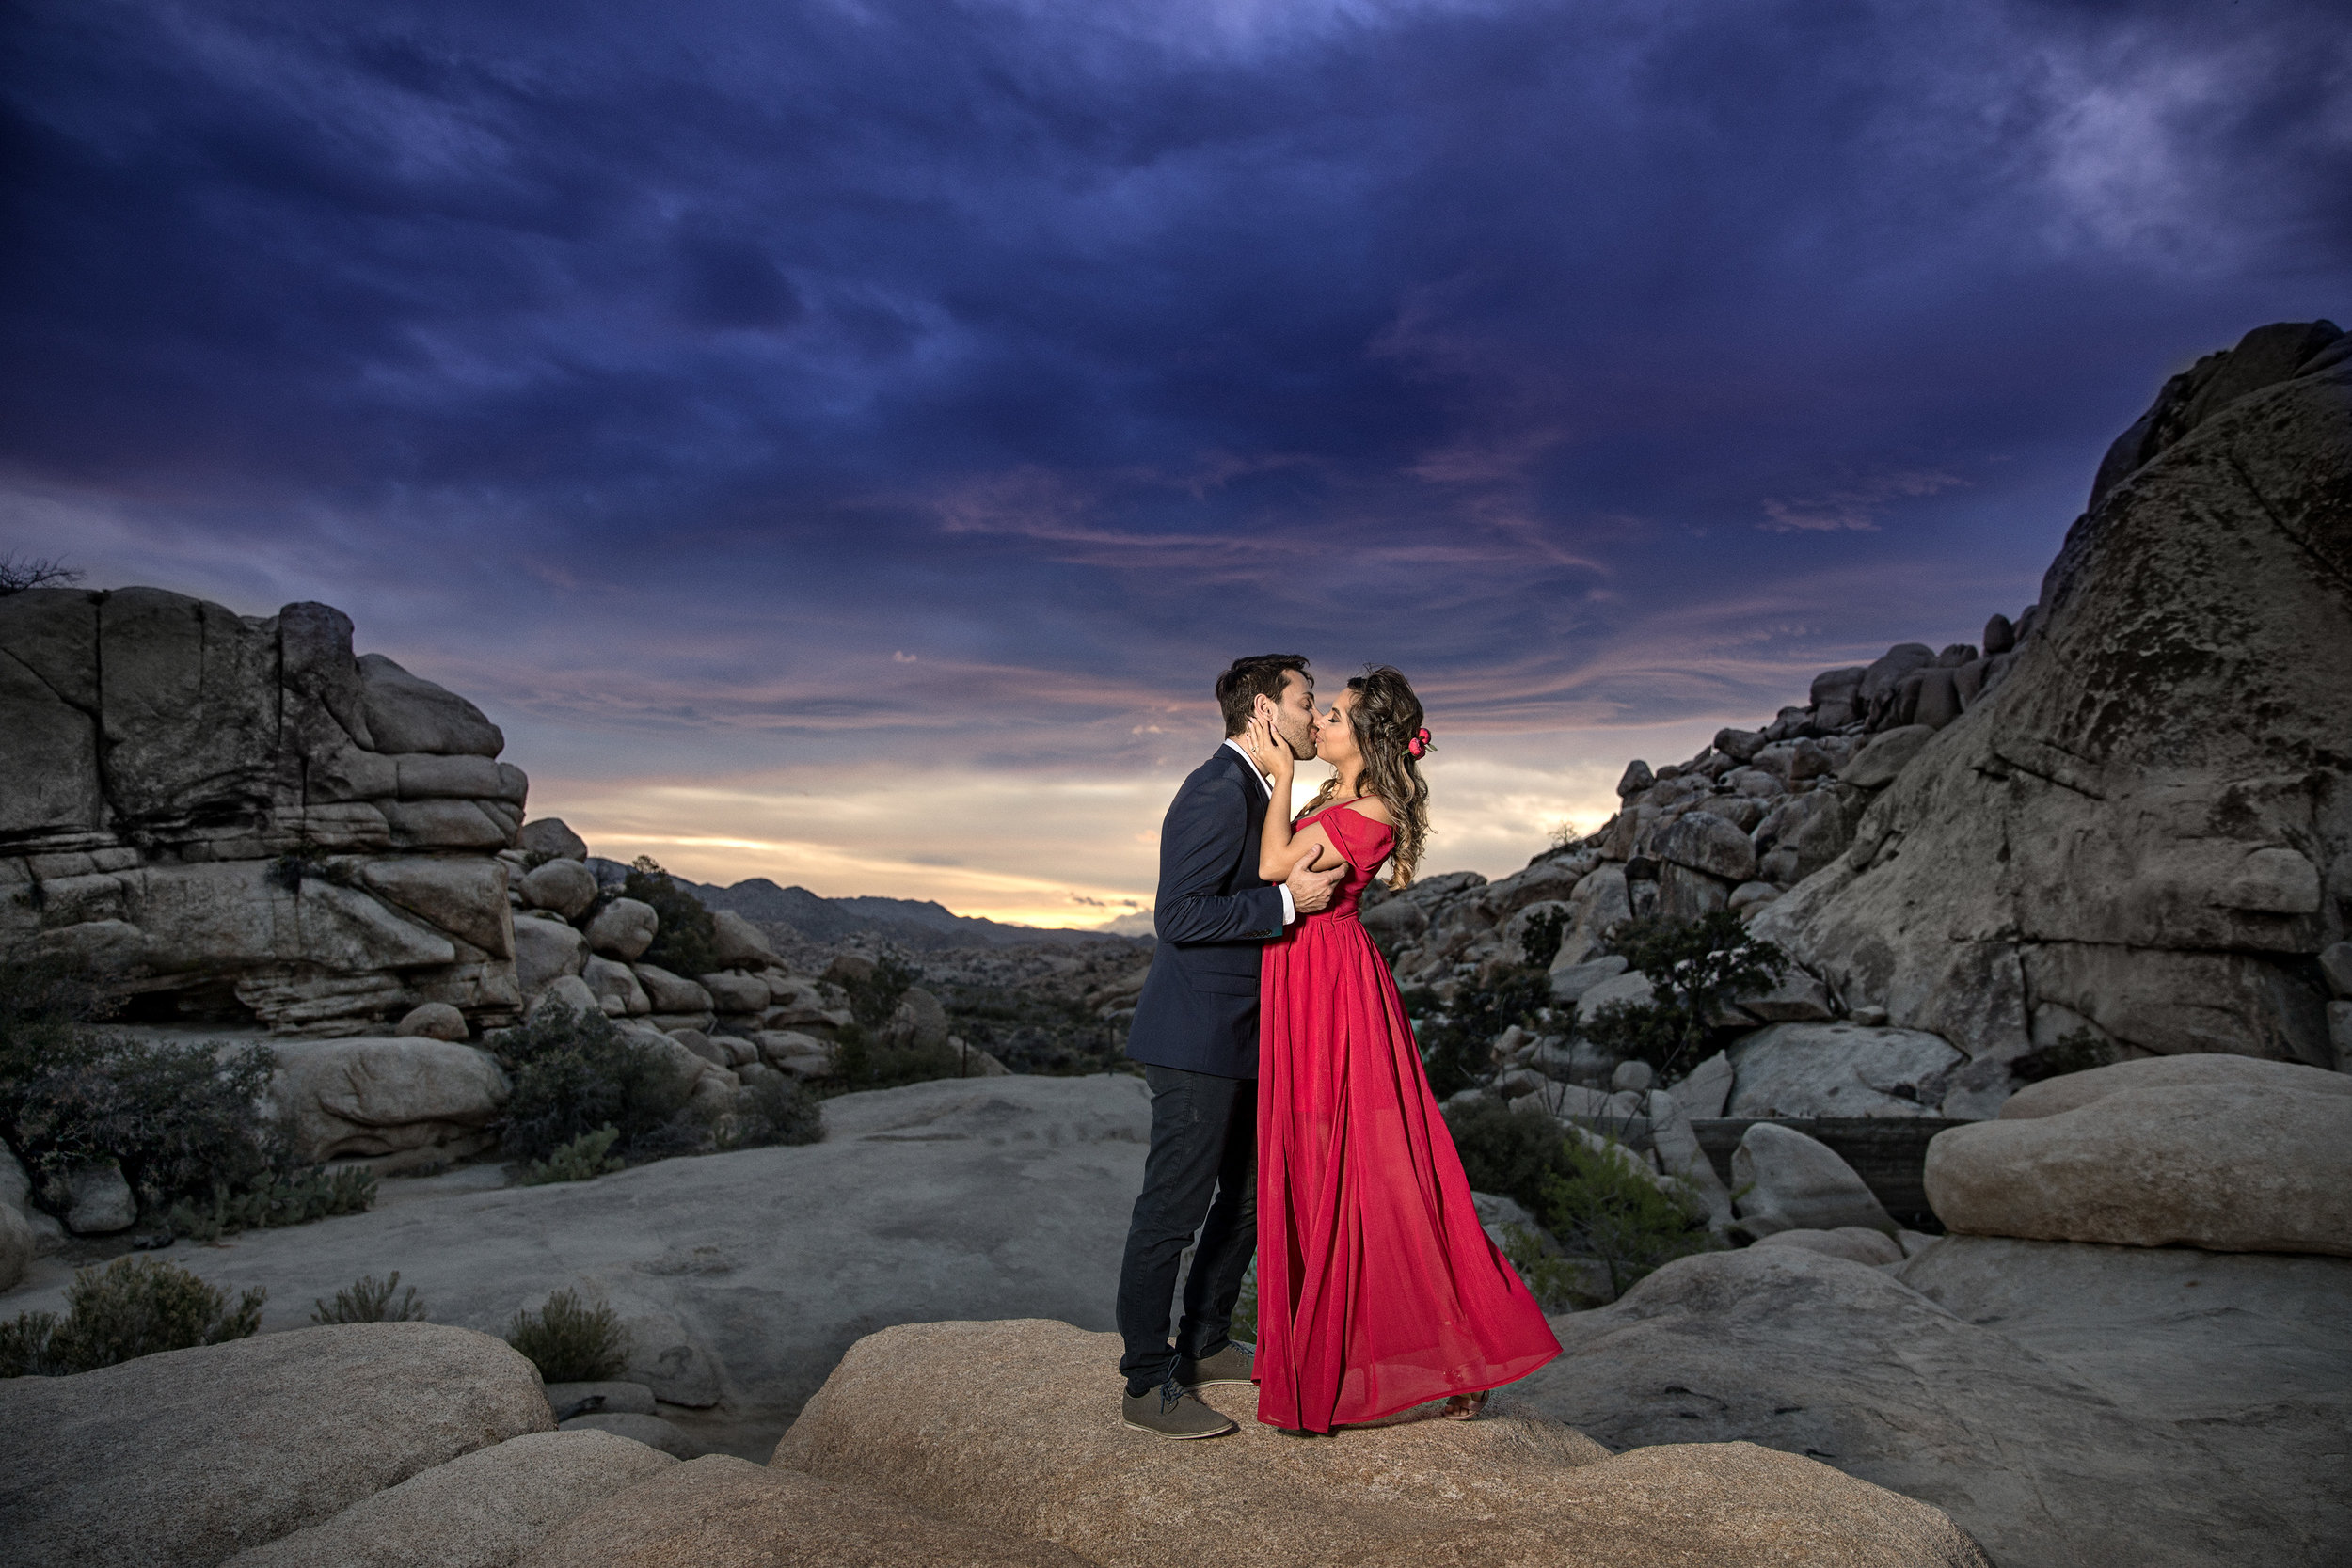 Yaneck-Wasiek-Portraits-Brazilian-Romance-At-Sunset.jpg